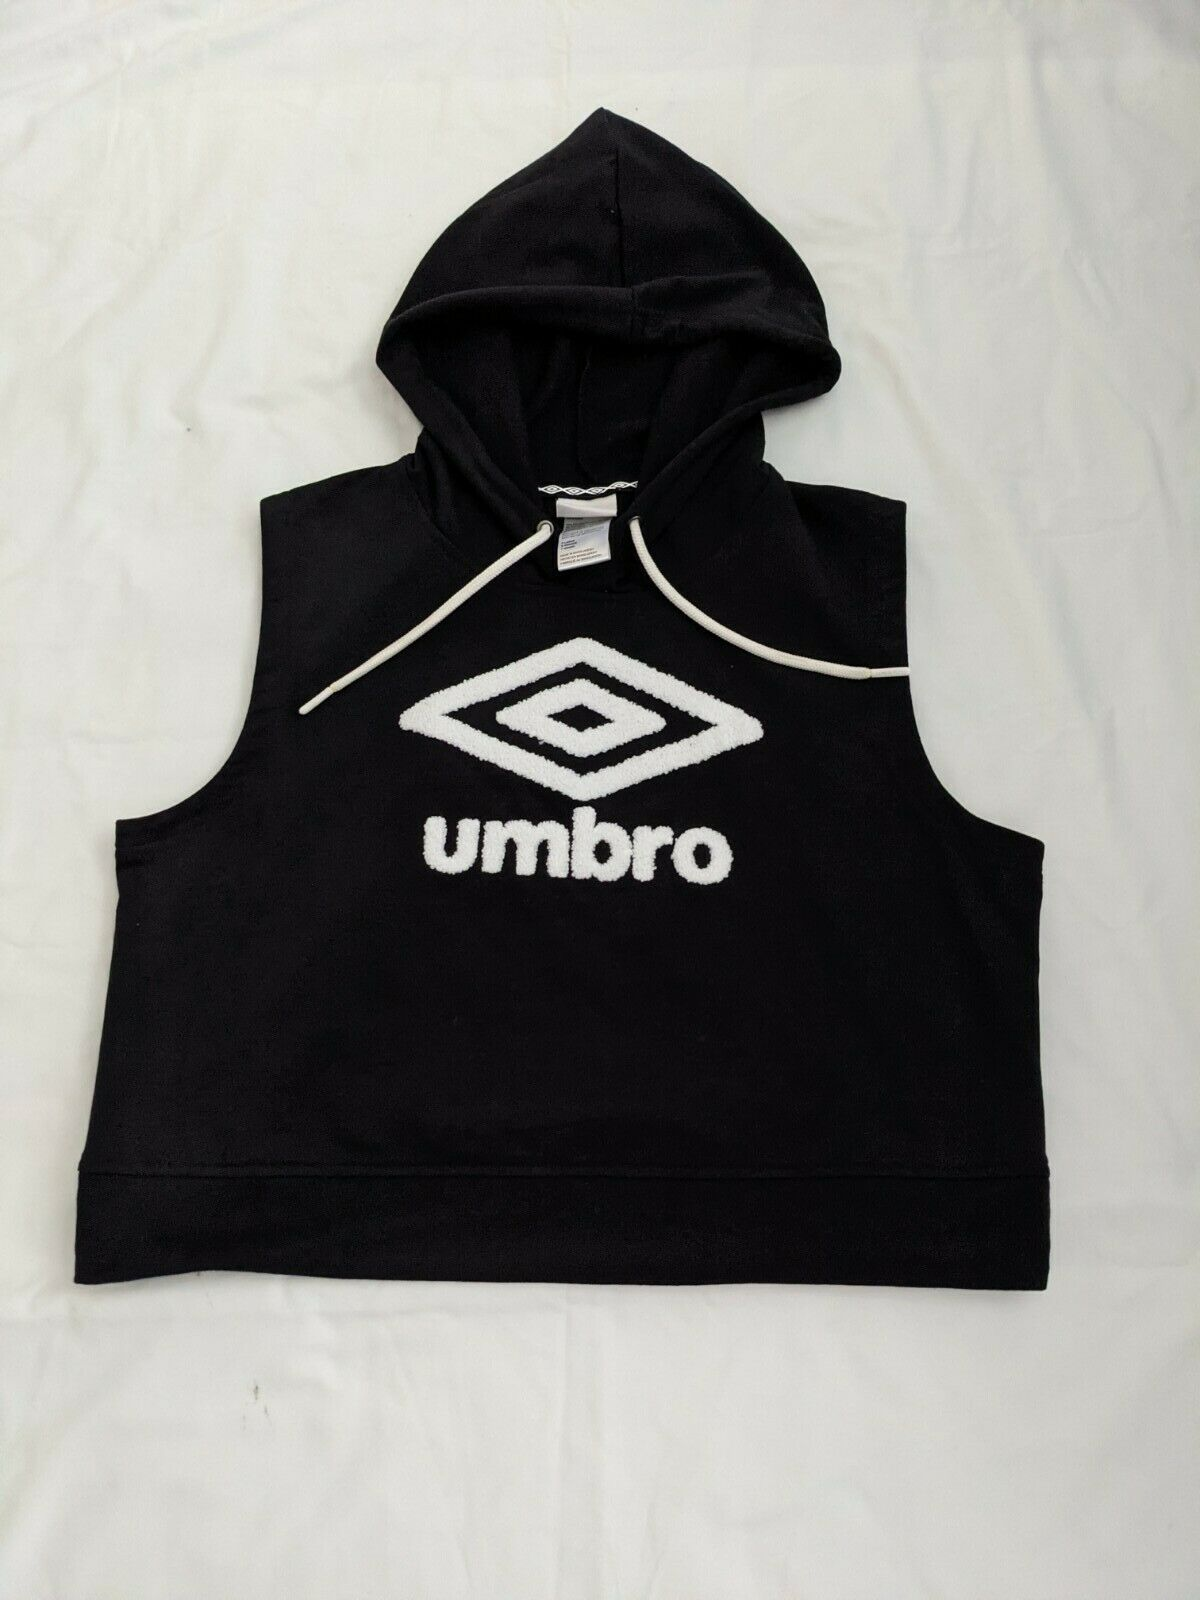 Umbro Women Black Sleeveless Crop Sweatshirt Hoodie - XL